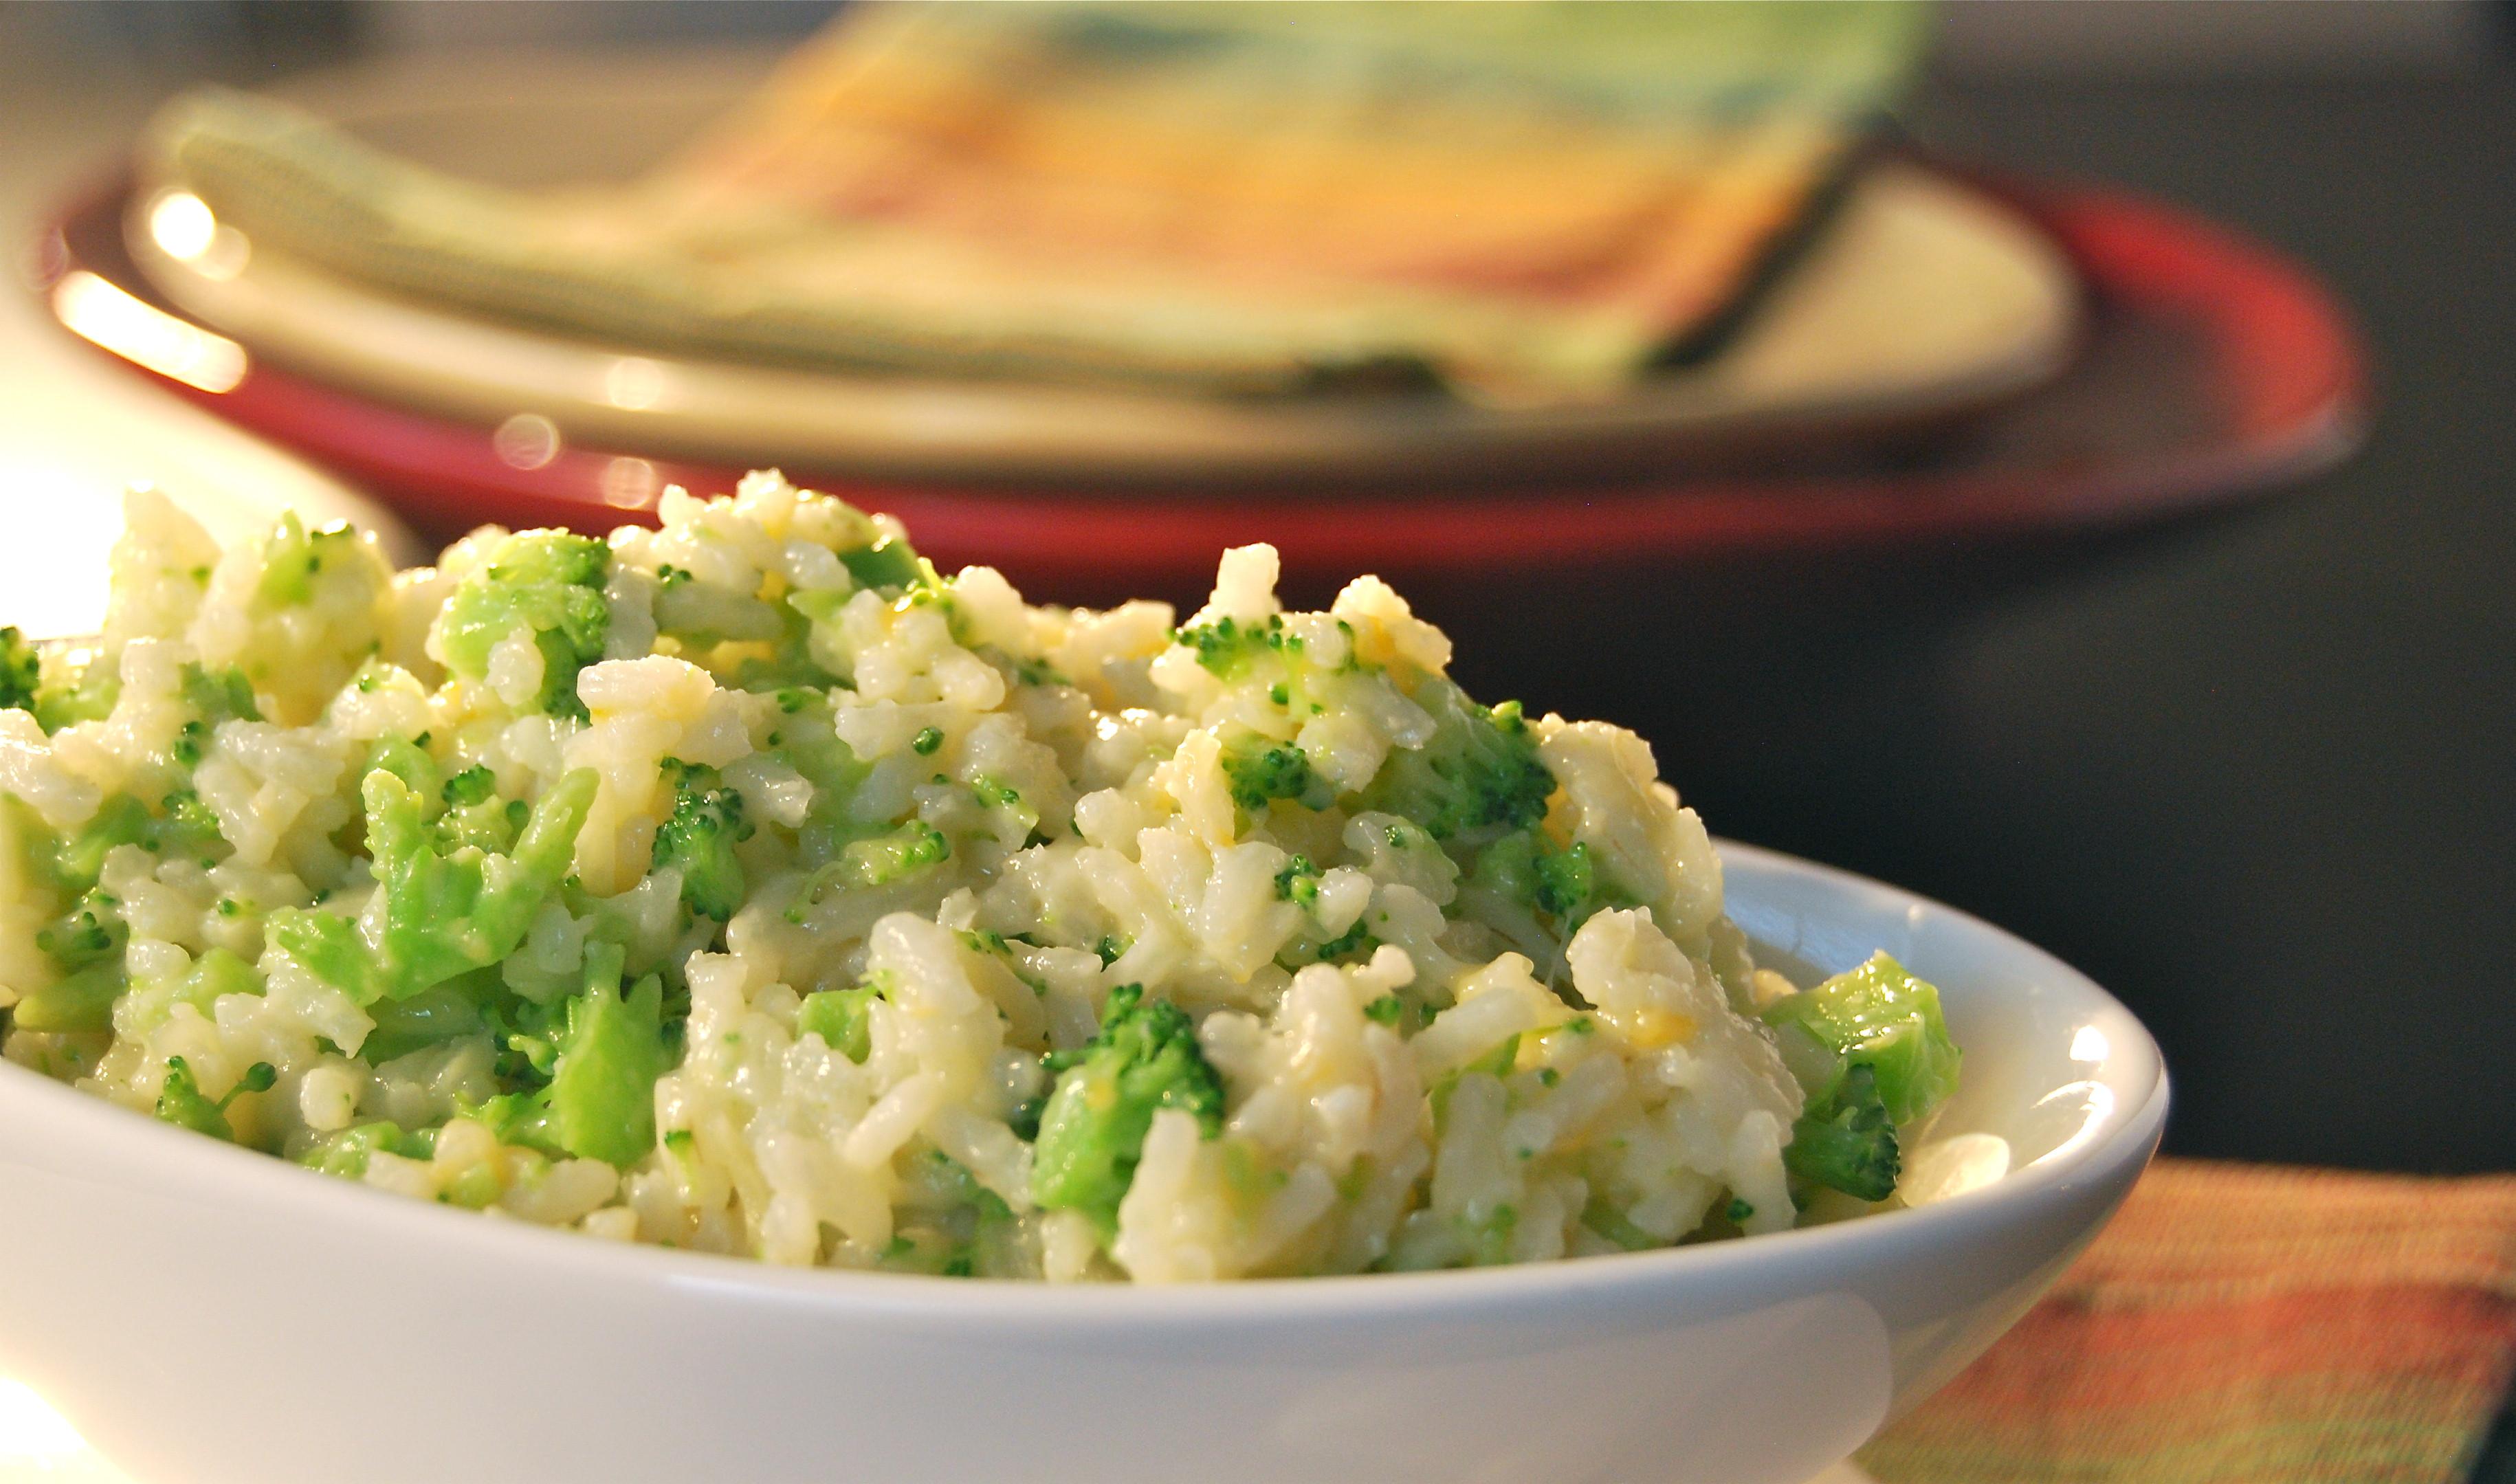 Broccoli Cheese Rice  Cheesy Rice with Broccoli Macaroni and Cheesecake